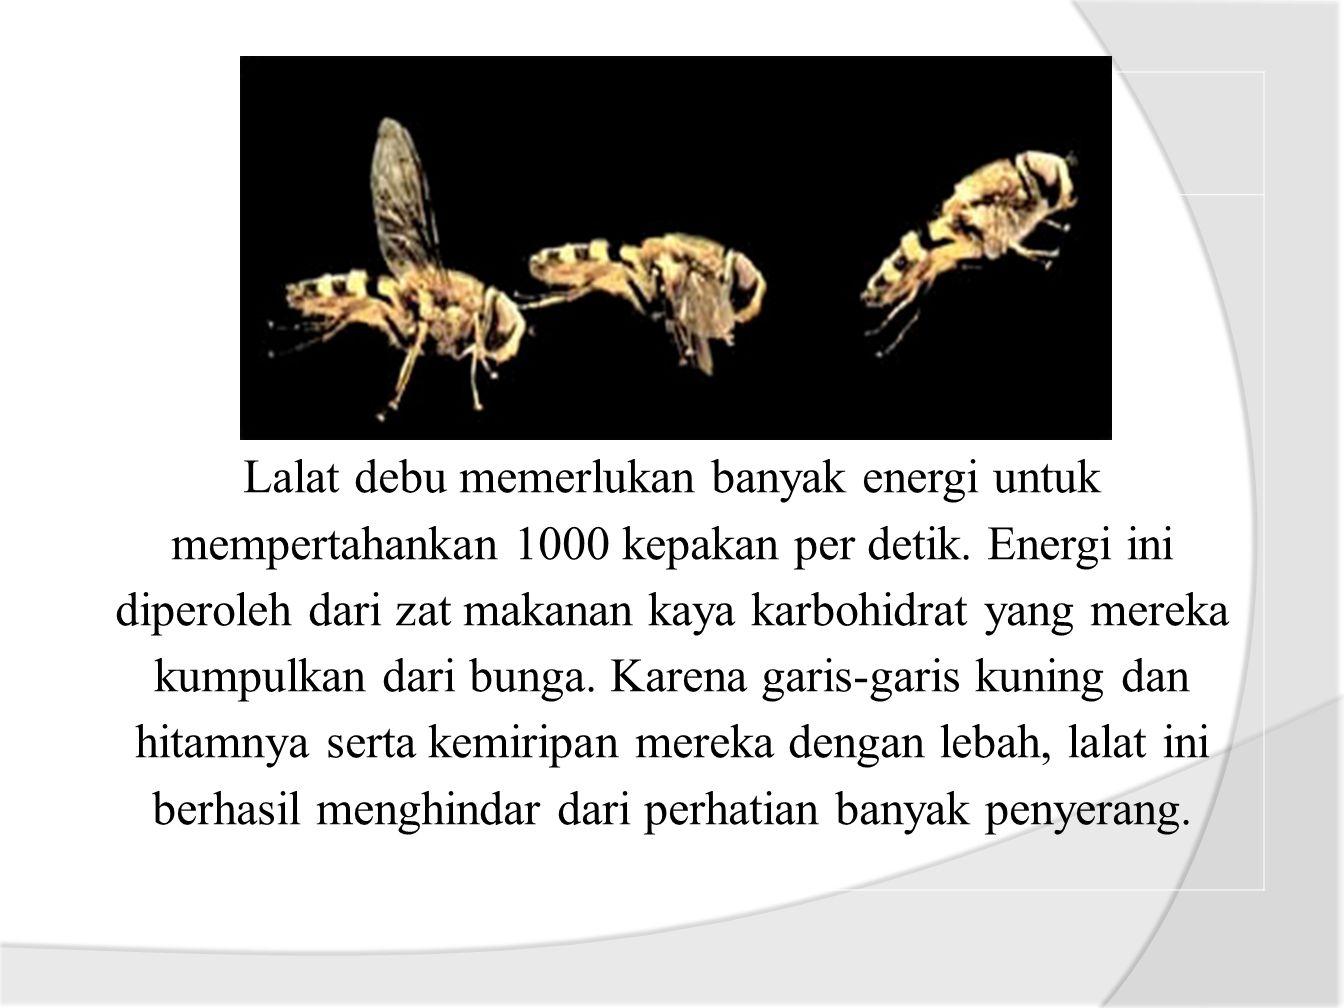 Lalat debu memerlukan banyak energi untuk mempertahankan 1000 kepakan per detik.